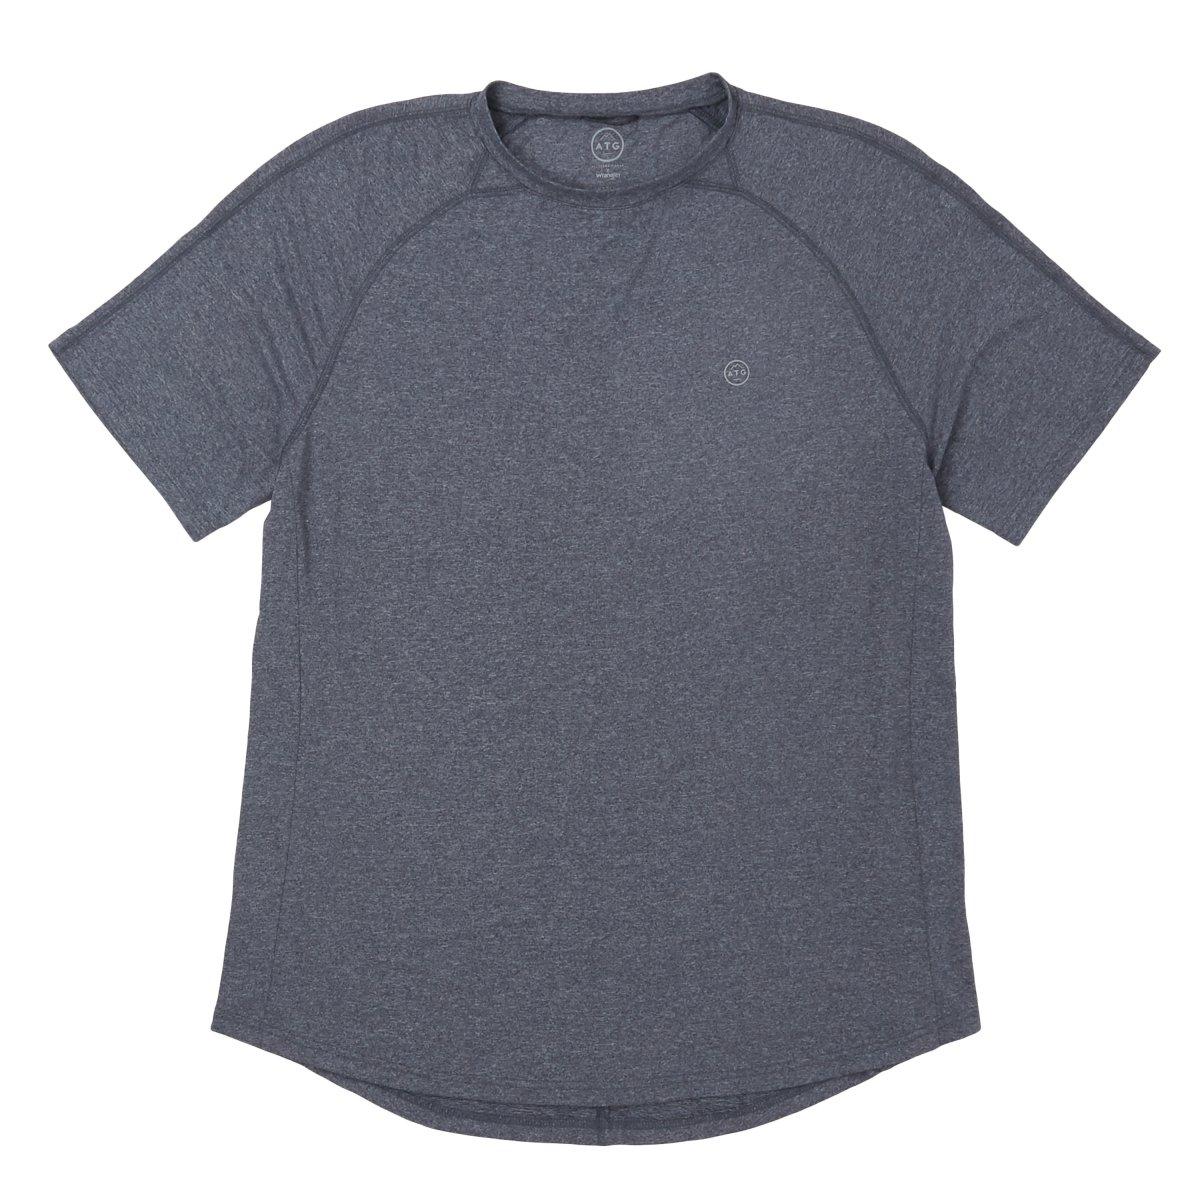 Performance Tee Shirt from Wrangler